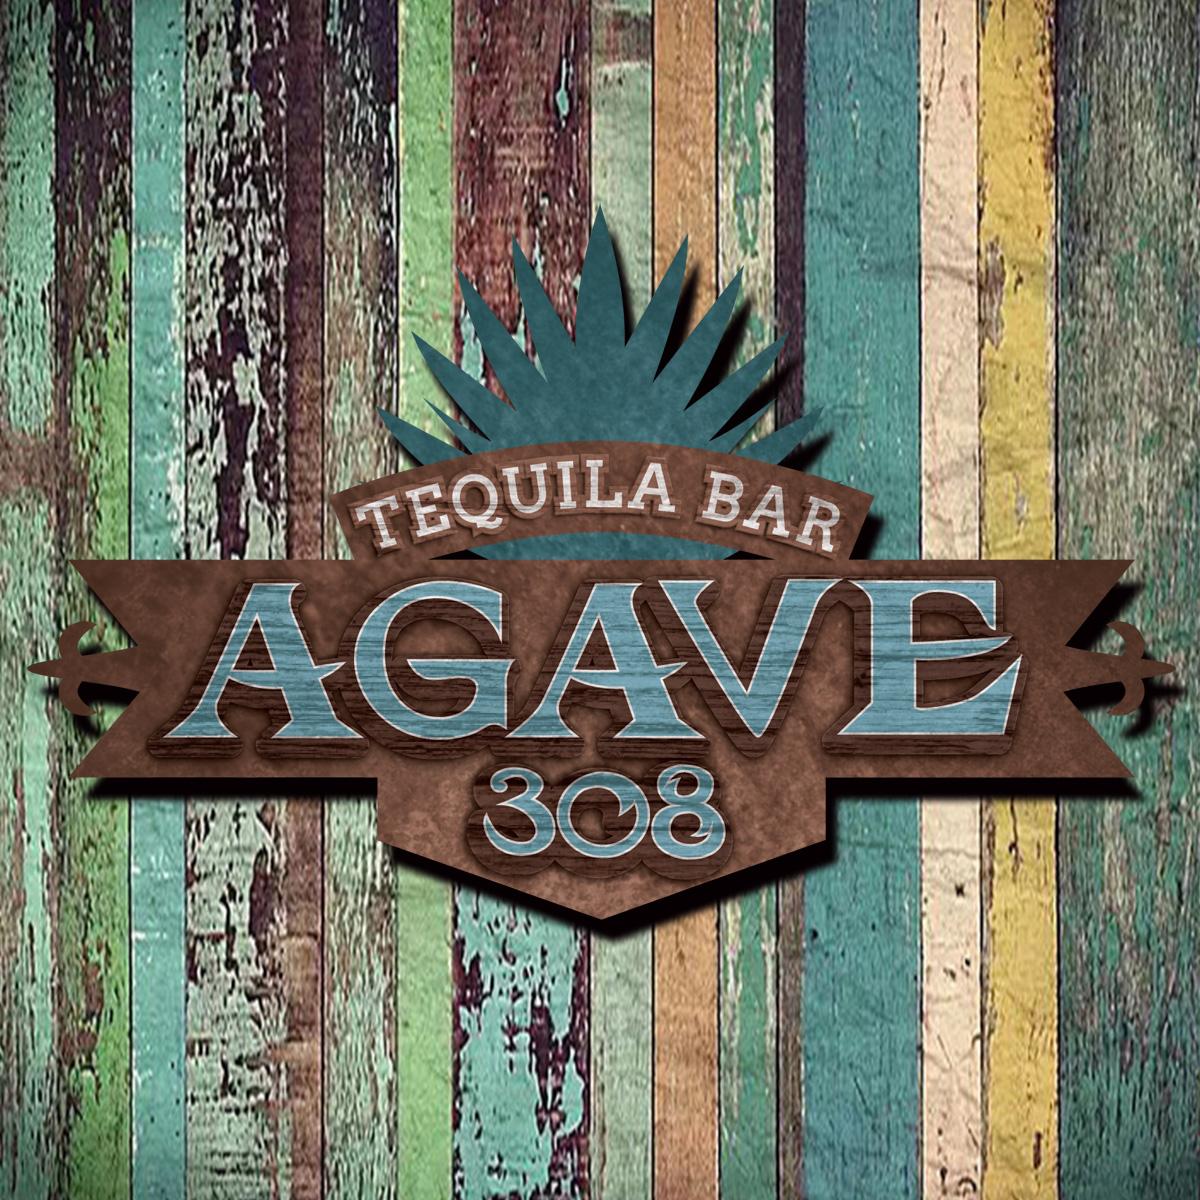 AGAVE Tequila bar logo .jpg